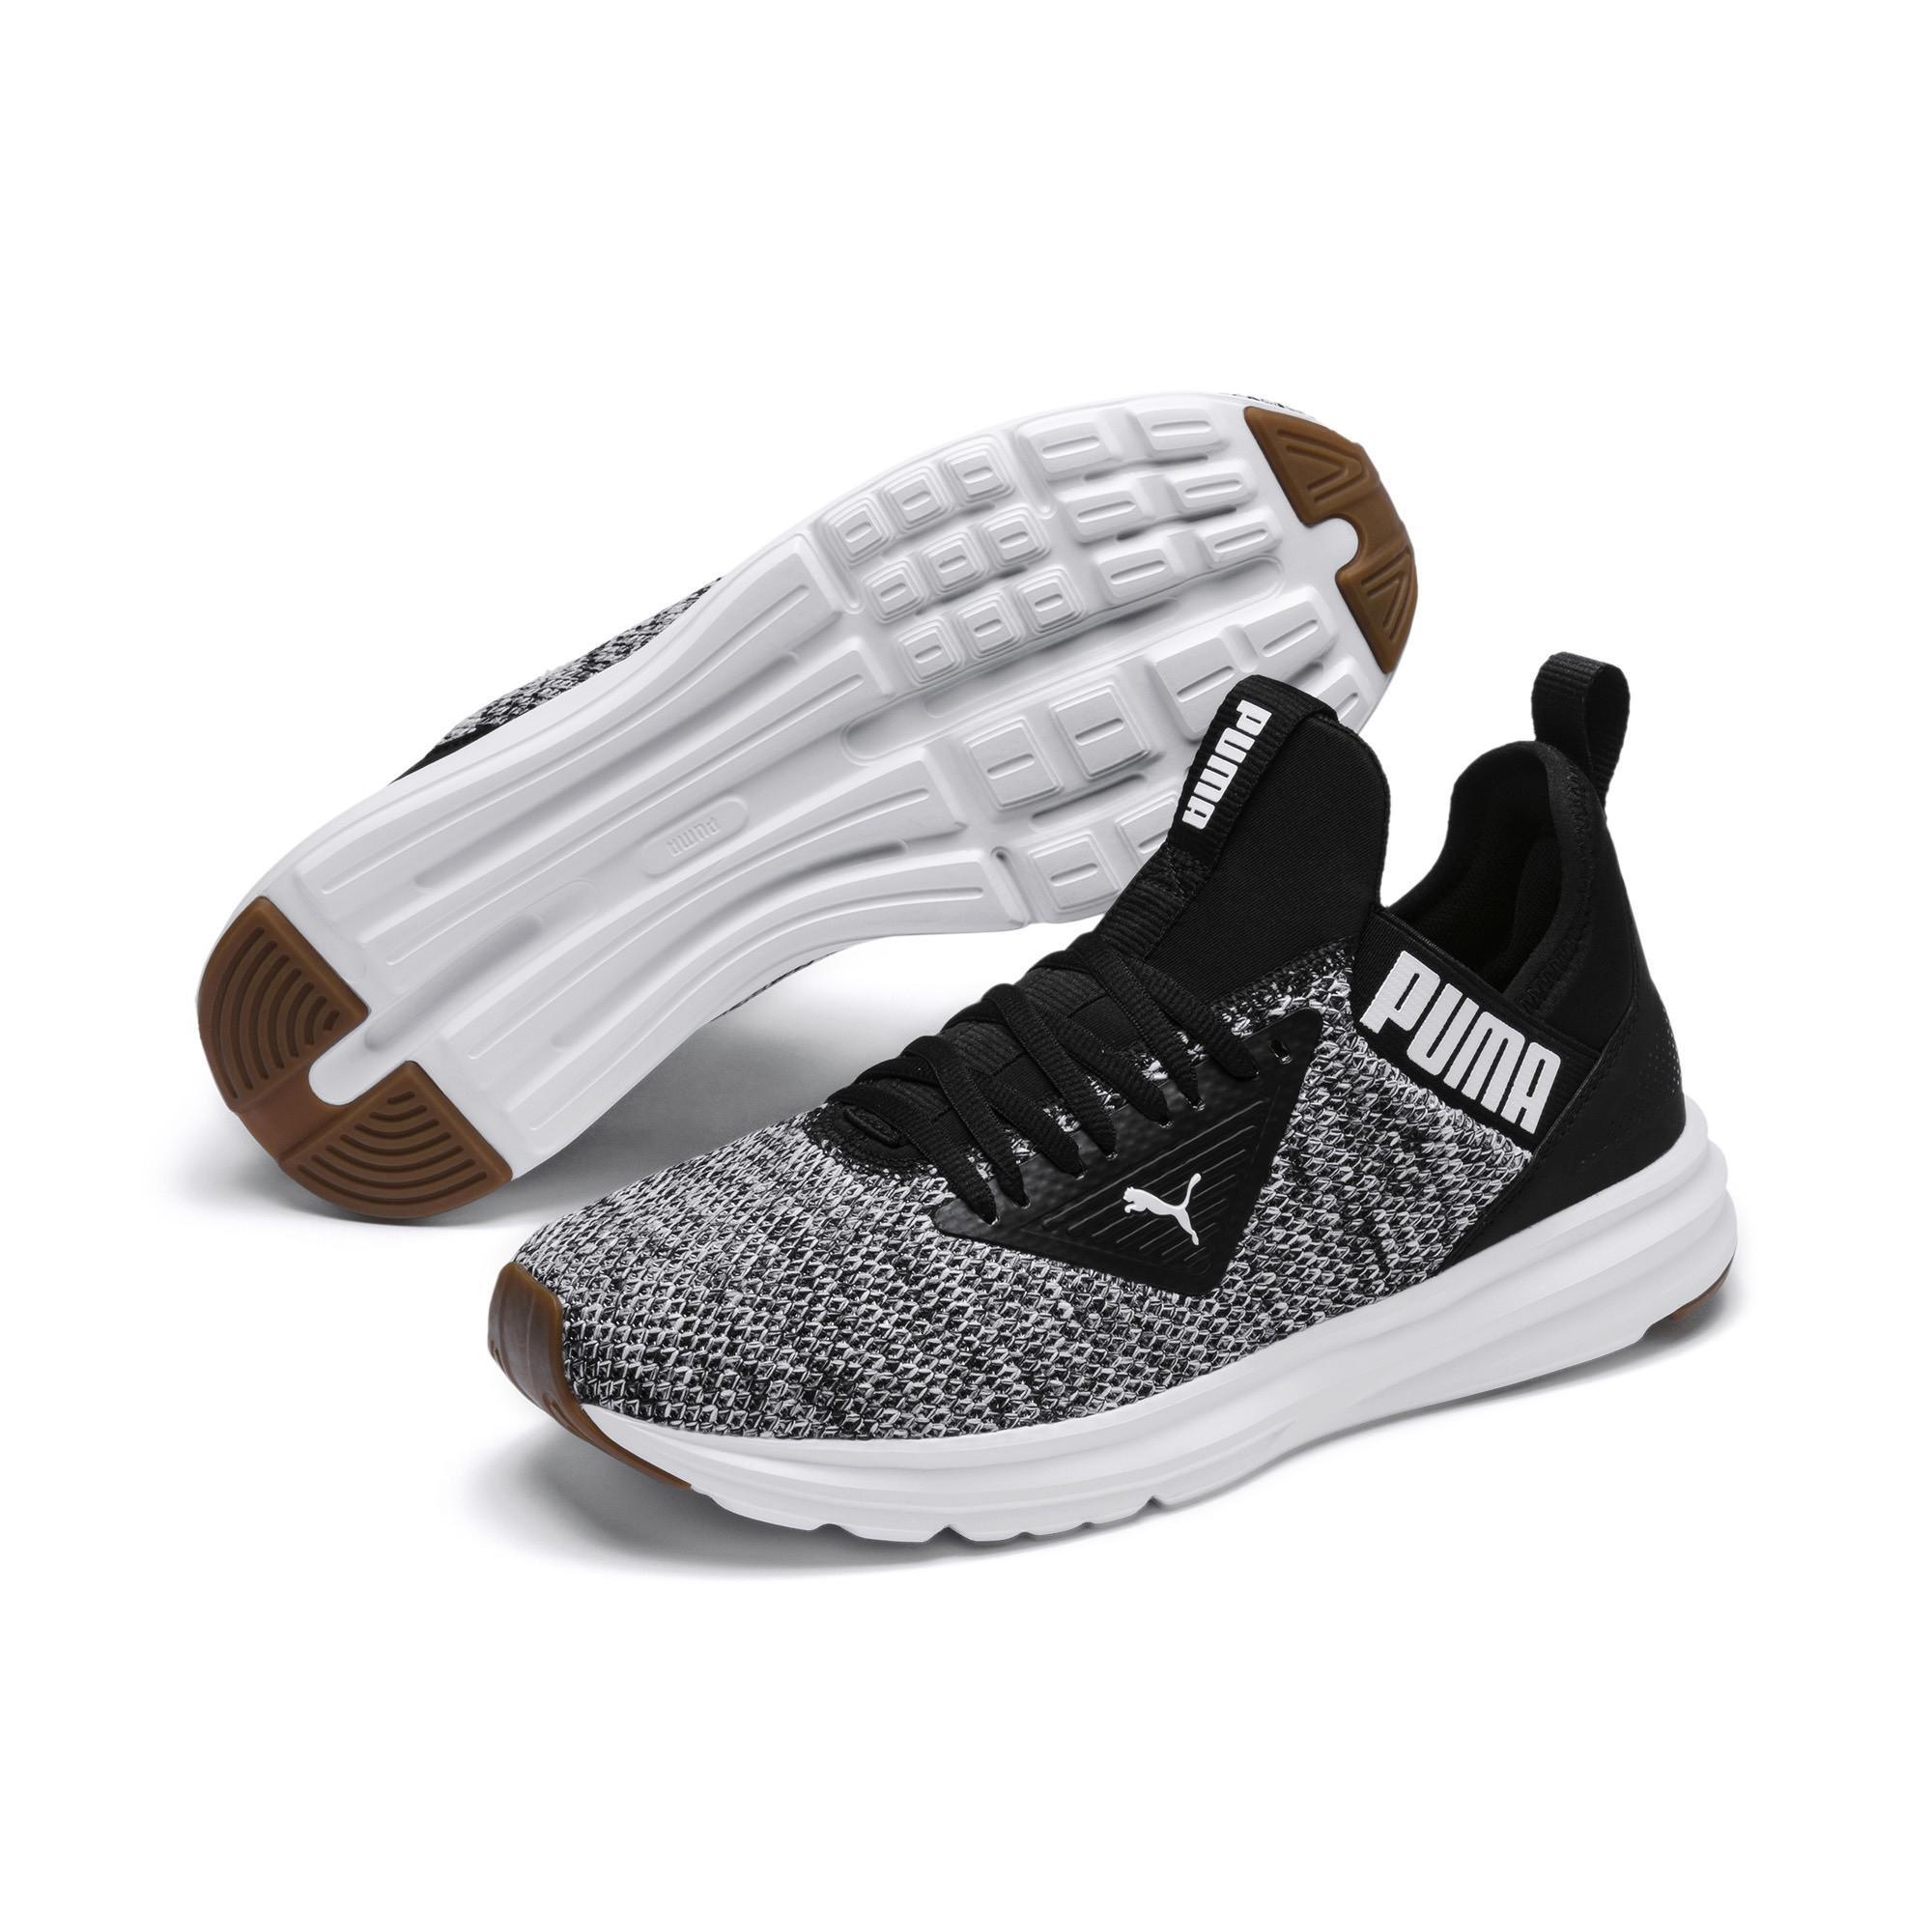 Nike Air Max 97 castagno